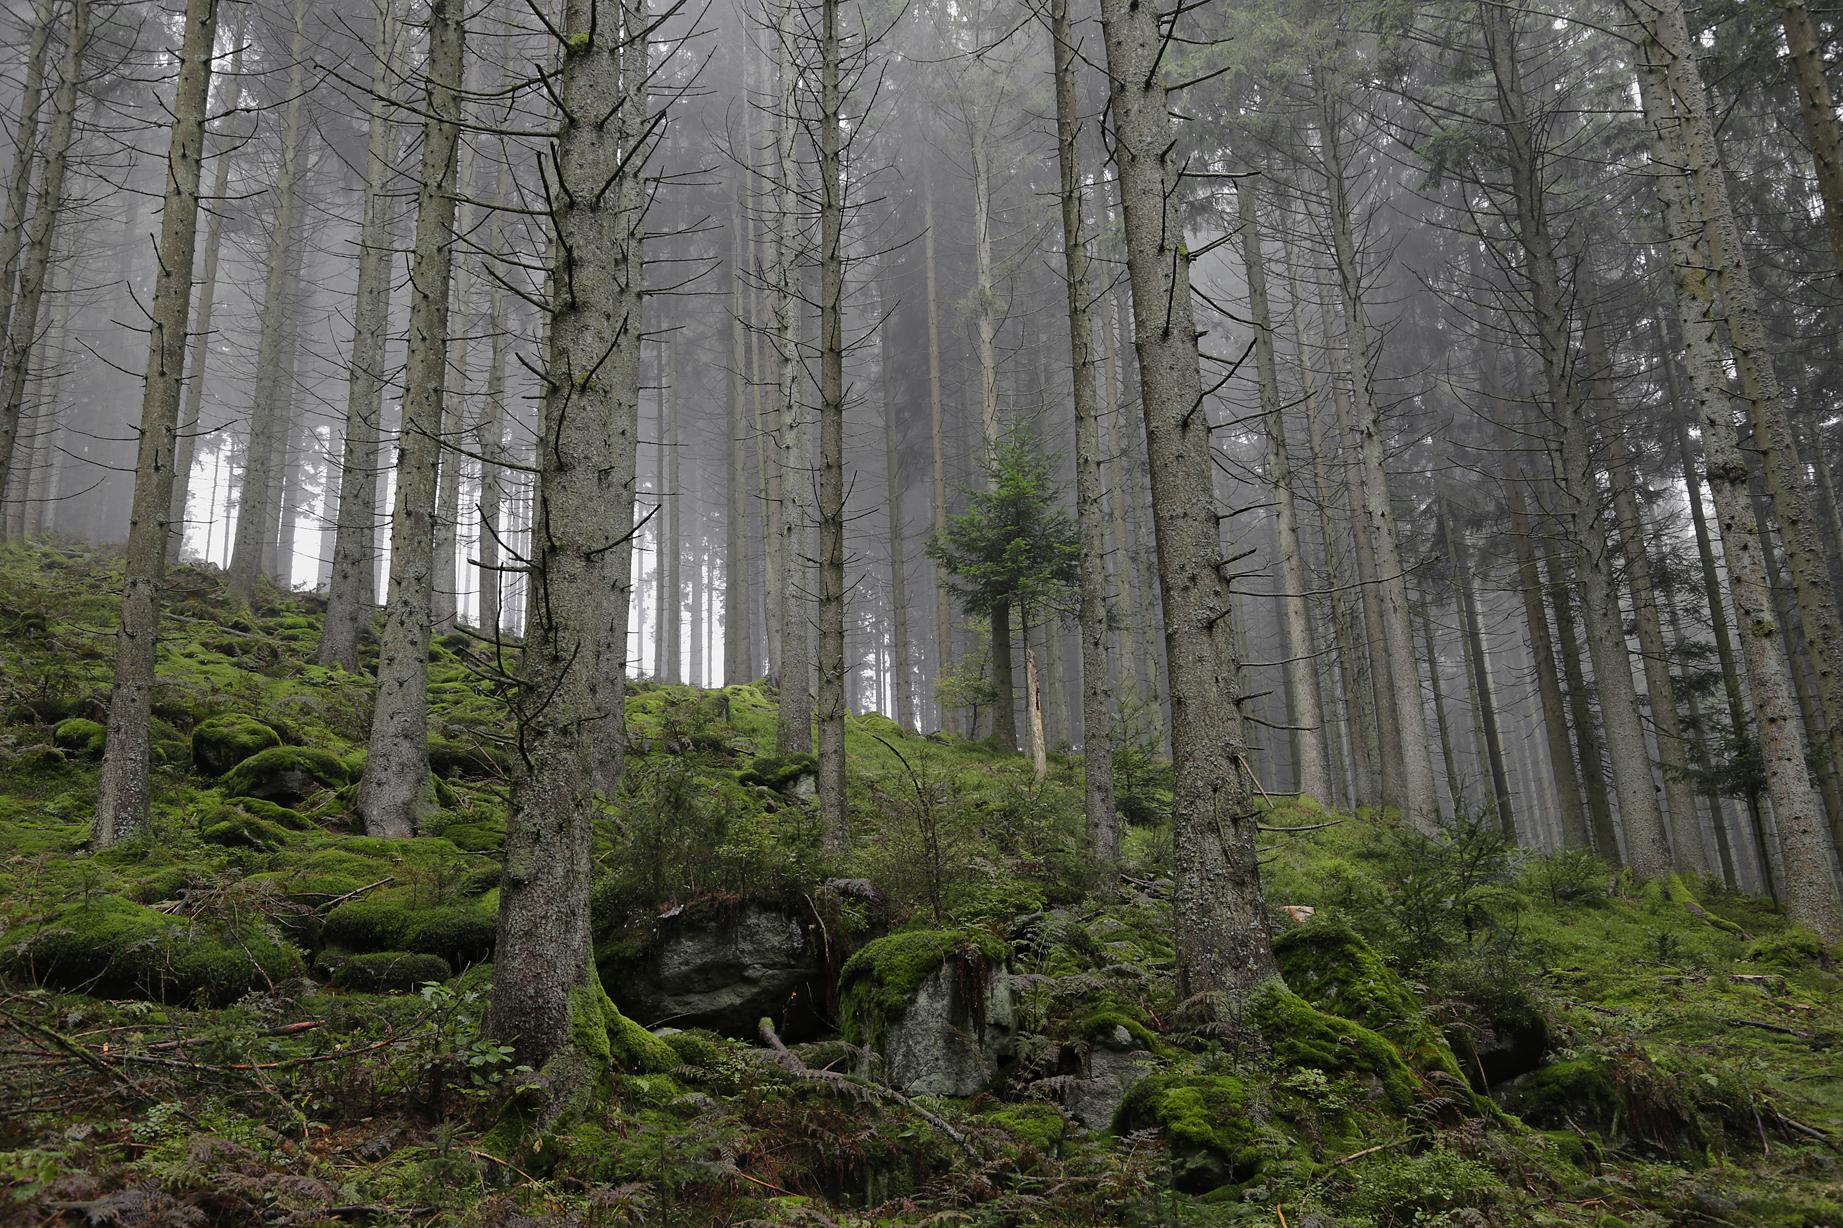 Bergwald im Spätsommer - ©Ralph Sturm